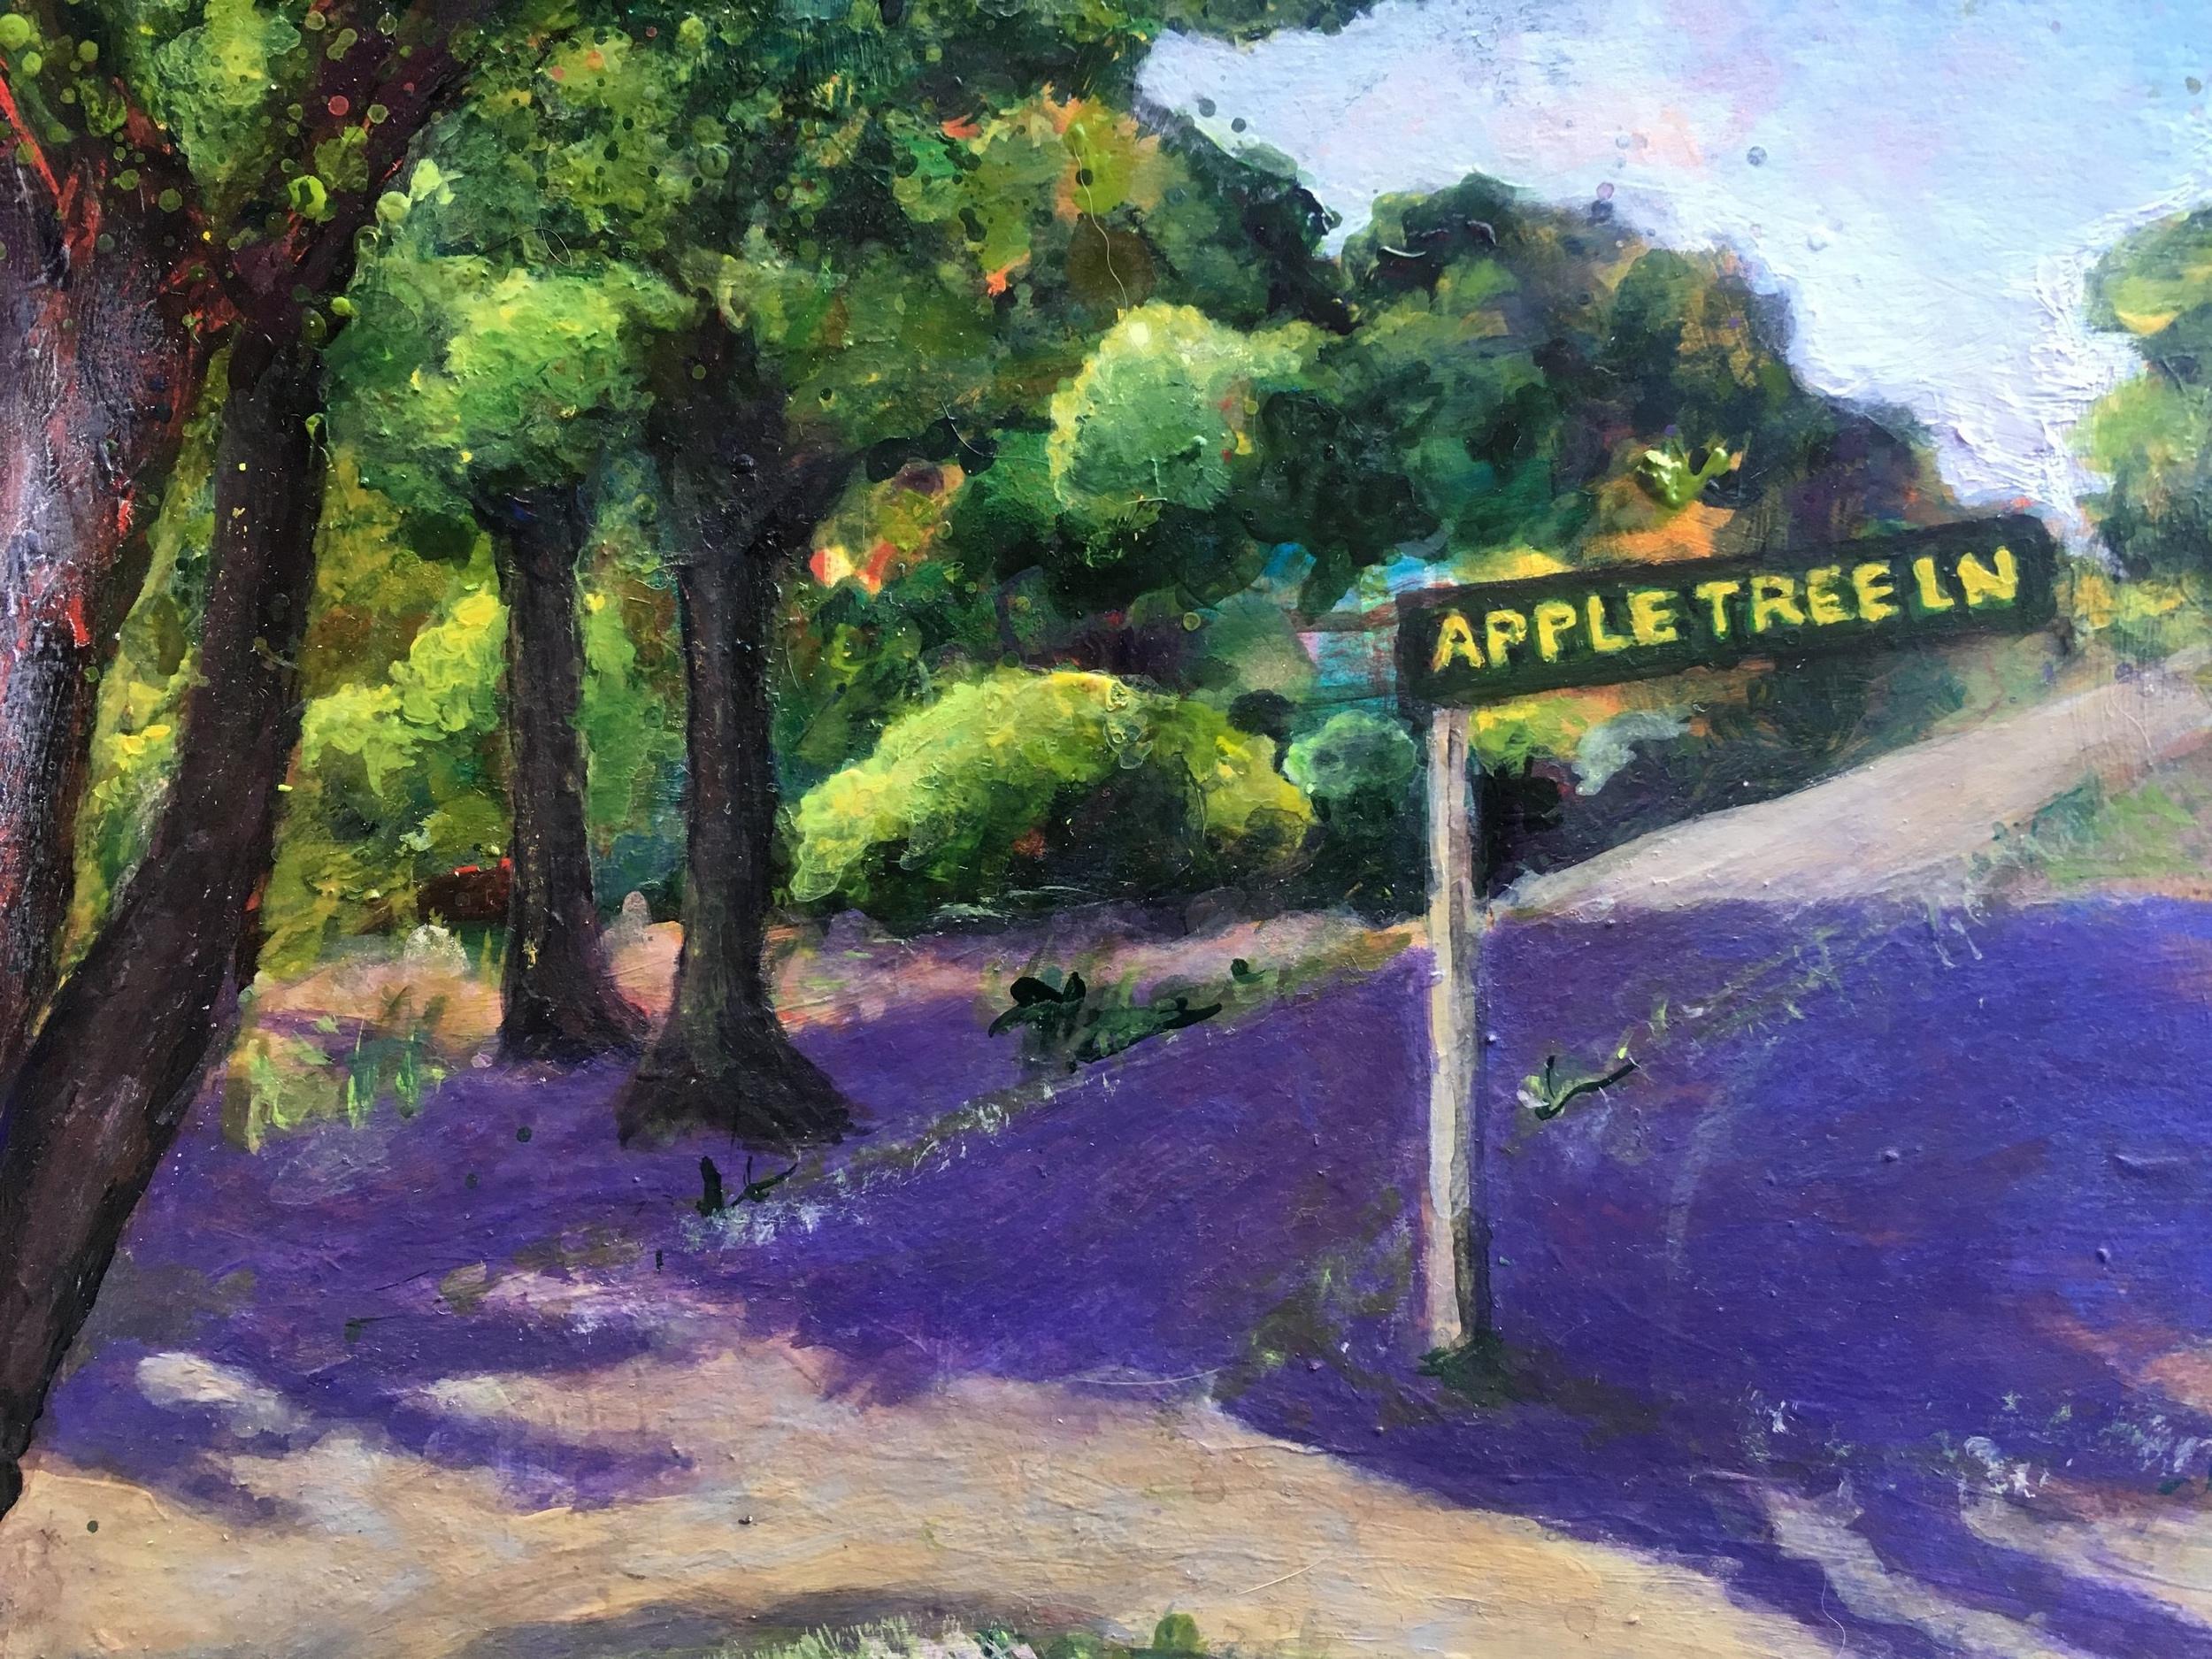 Apple Tree Lane, Lopez Island, Washington